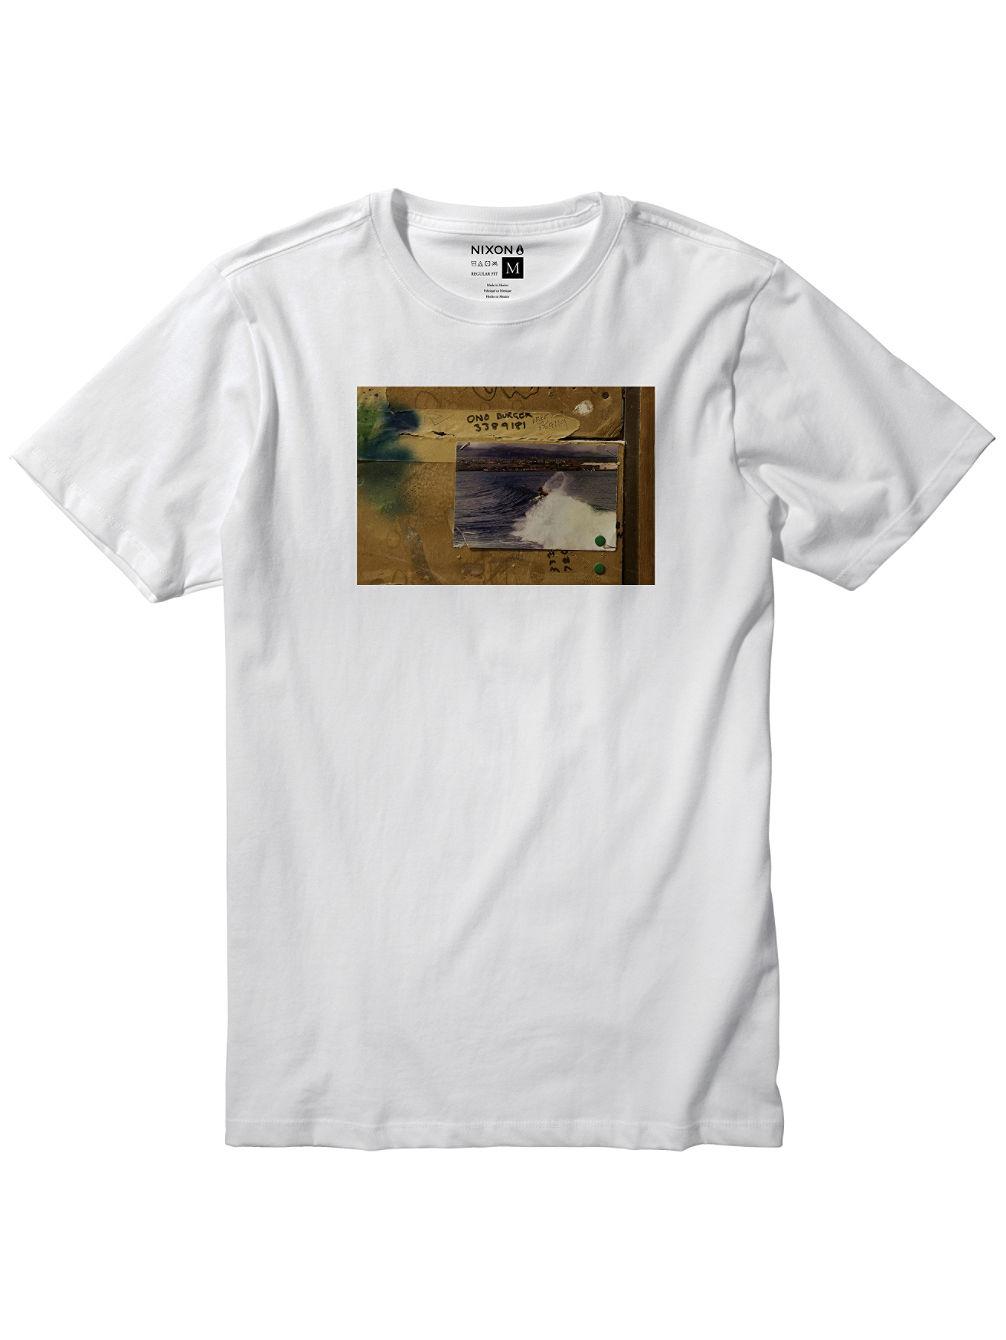 nixon-ono-photo-t-shirt